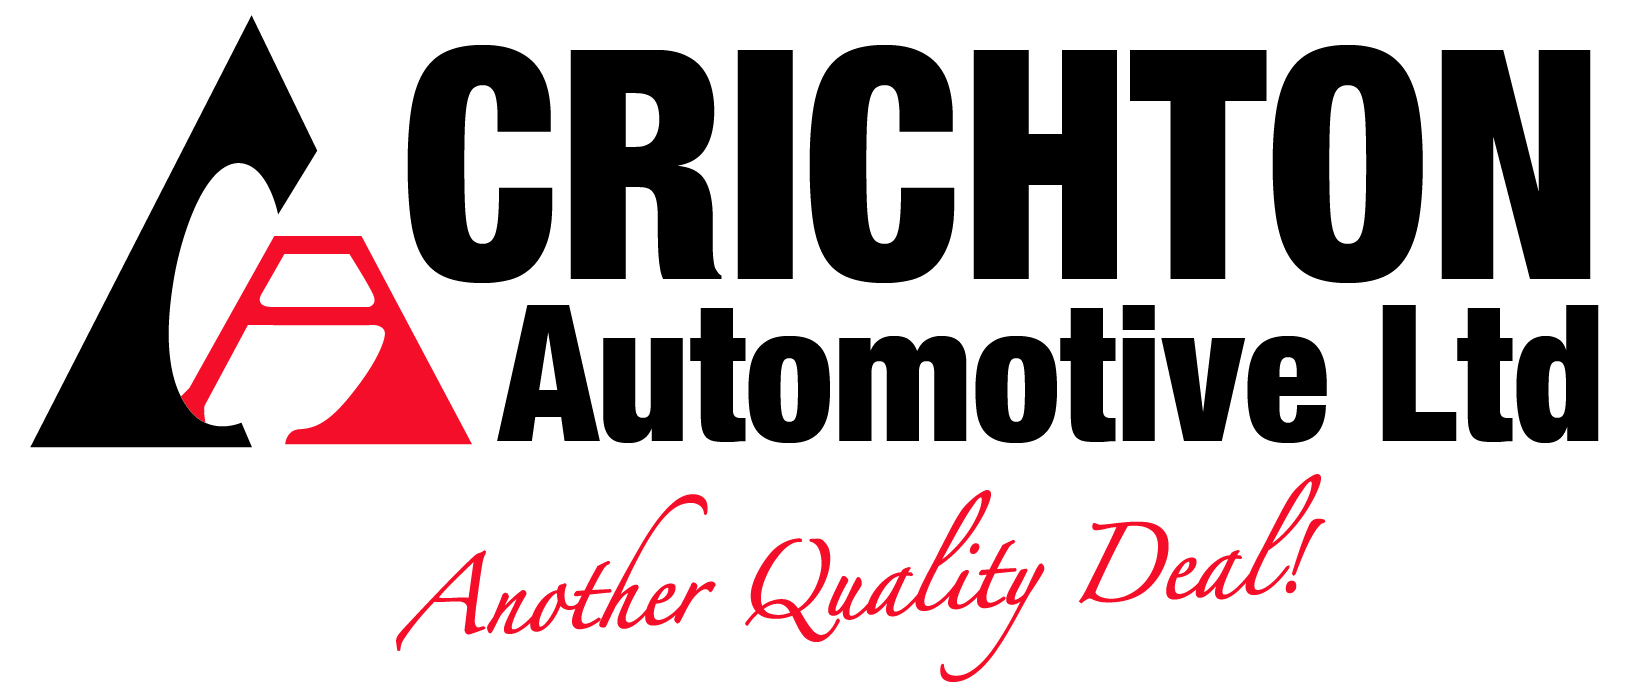 Crichton Auto